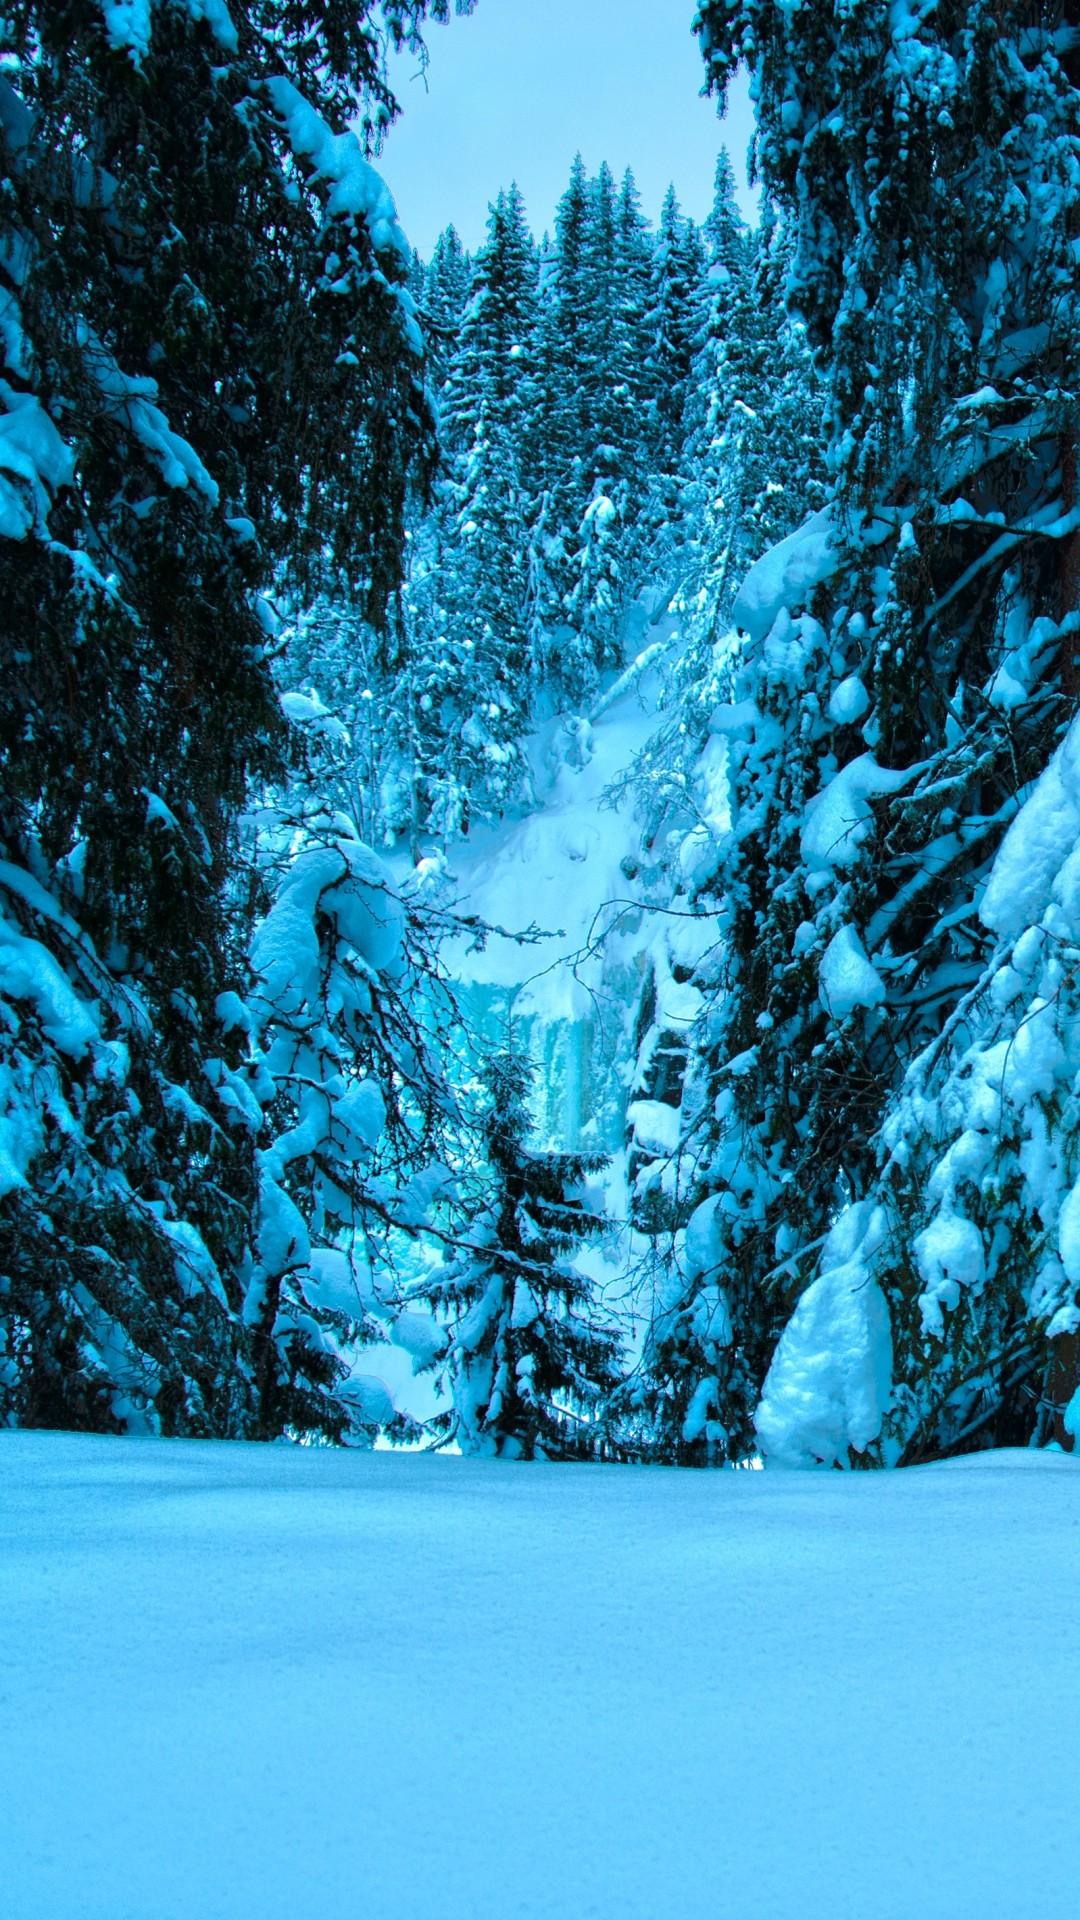 Snow iPhone Wallpaper HD – iPhone Wallpaper